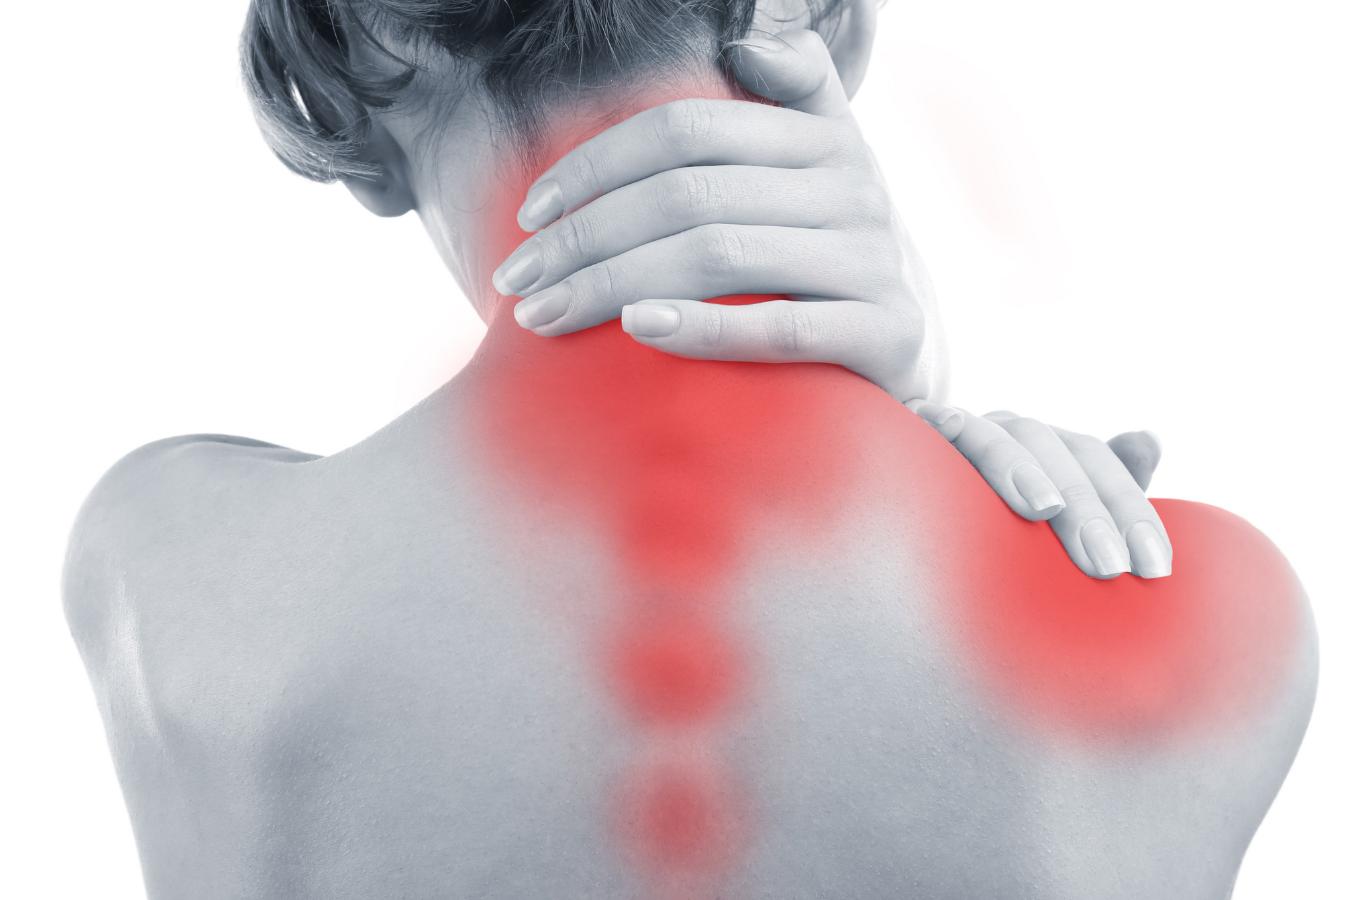 Artroza cervicala are tratament de stagnare? | sateleunitealeromaniei.ro